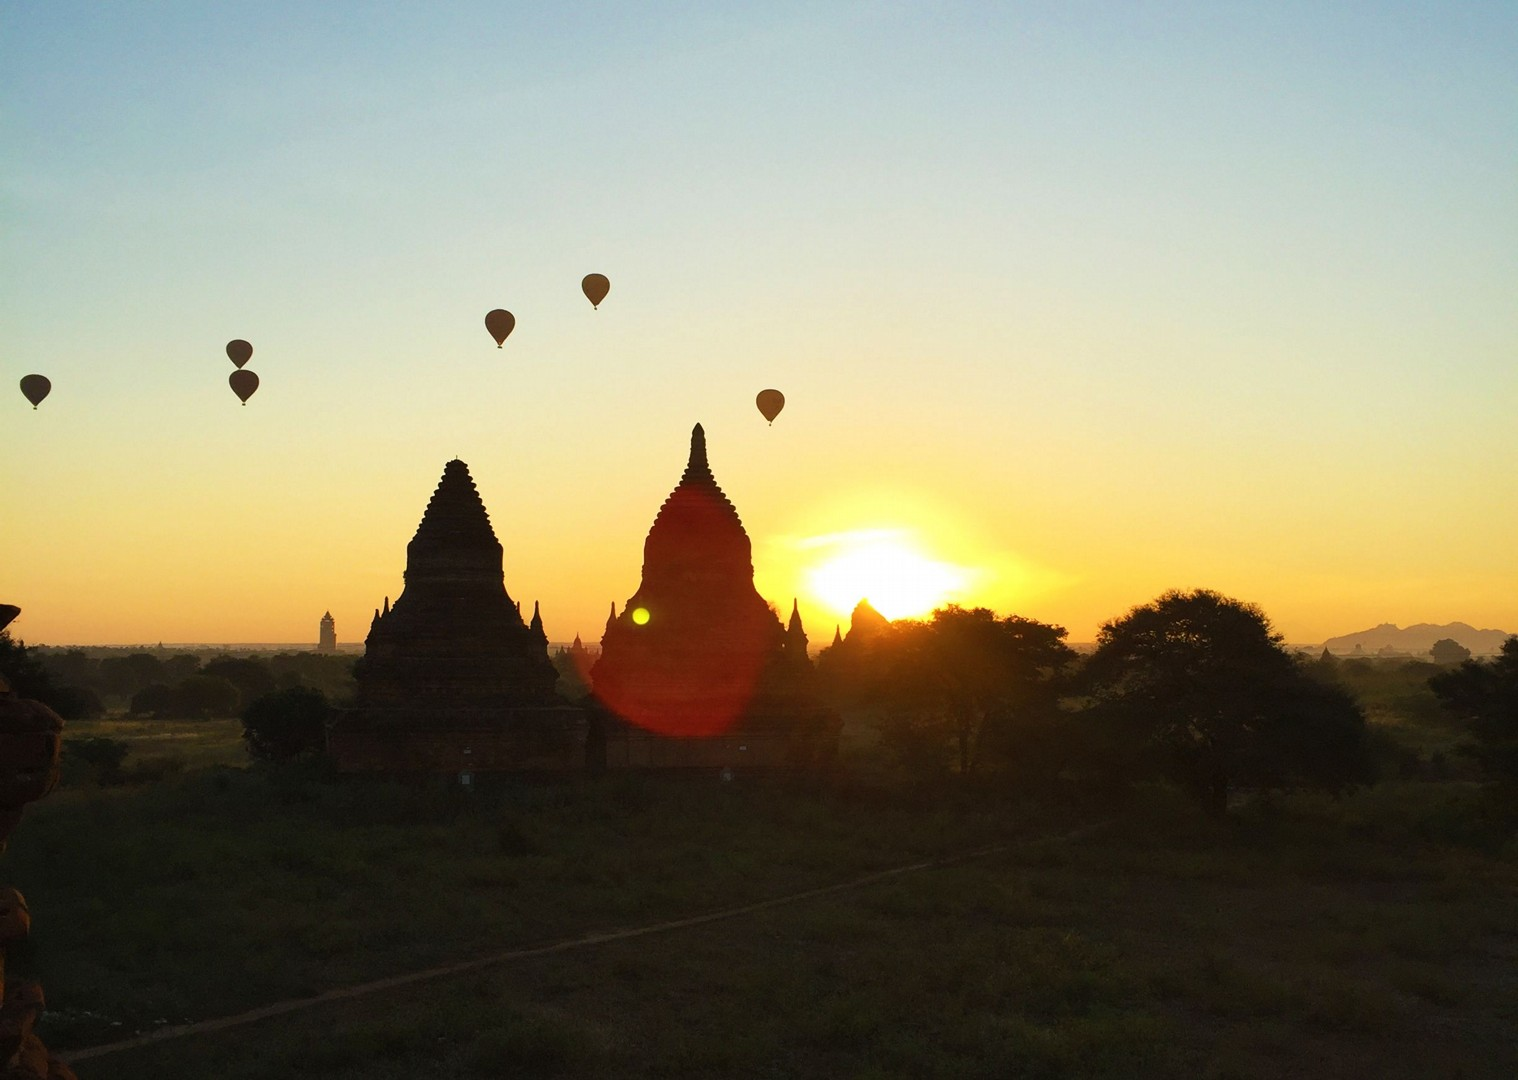 sunset-guided-group-cycling-burma.jpg - Myanmar (Burma) - Bagan and Beyond - Cycling Adventures